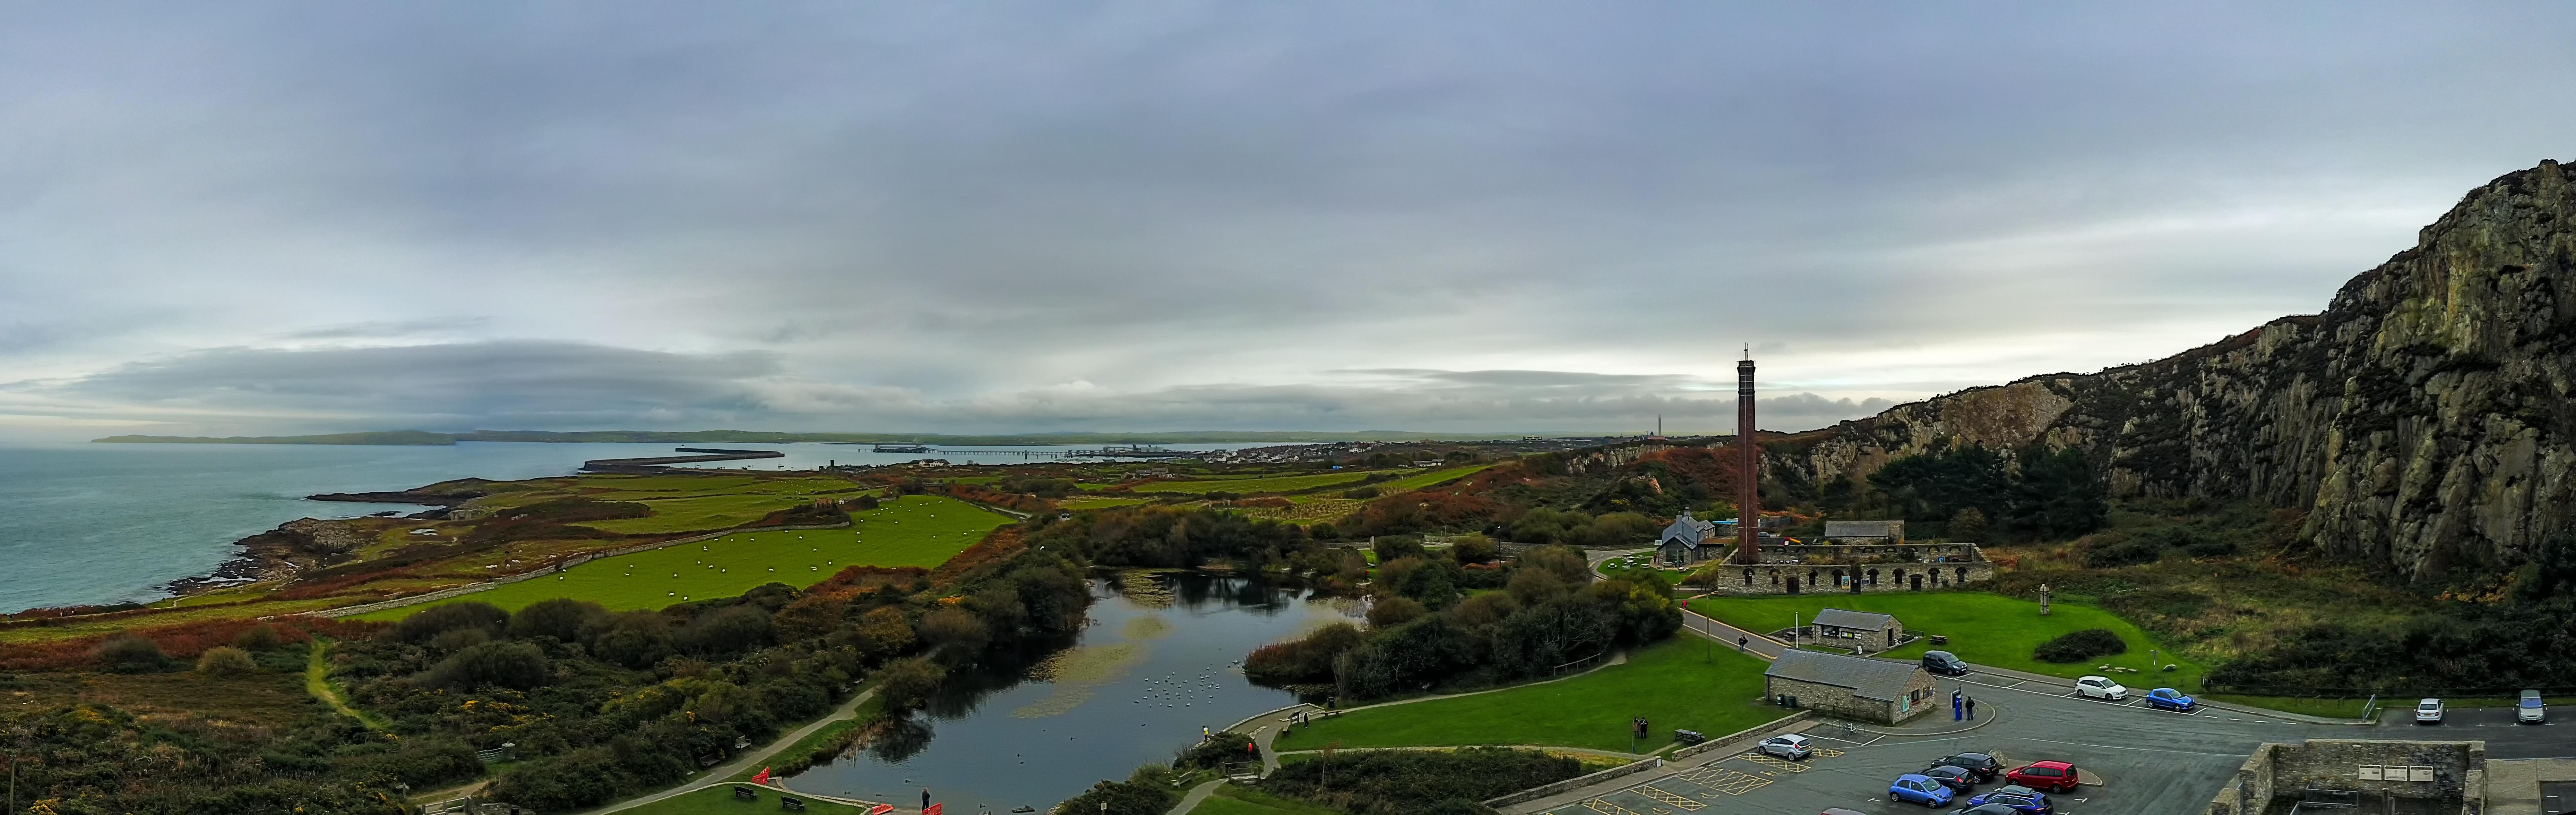 Panoramic Shots With Mavic Pro Dji Forum